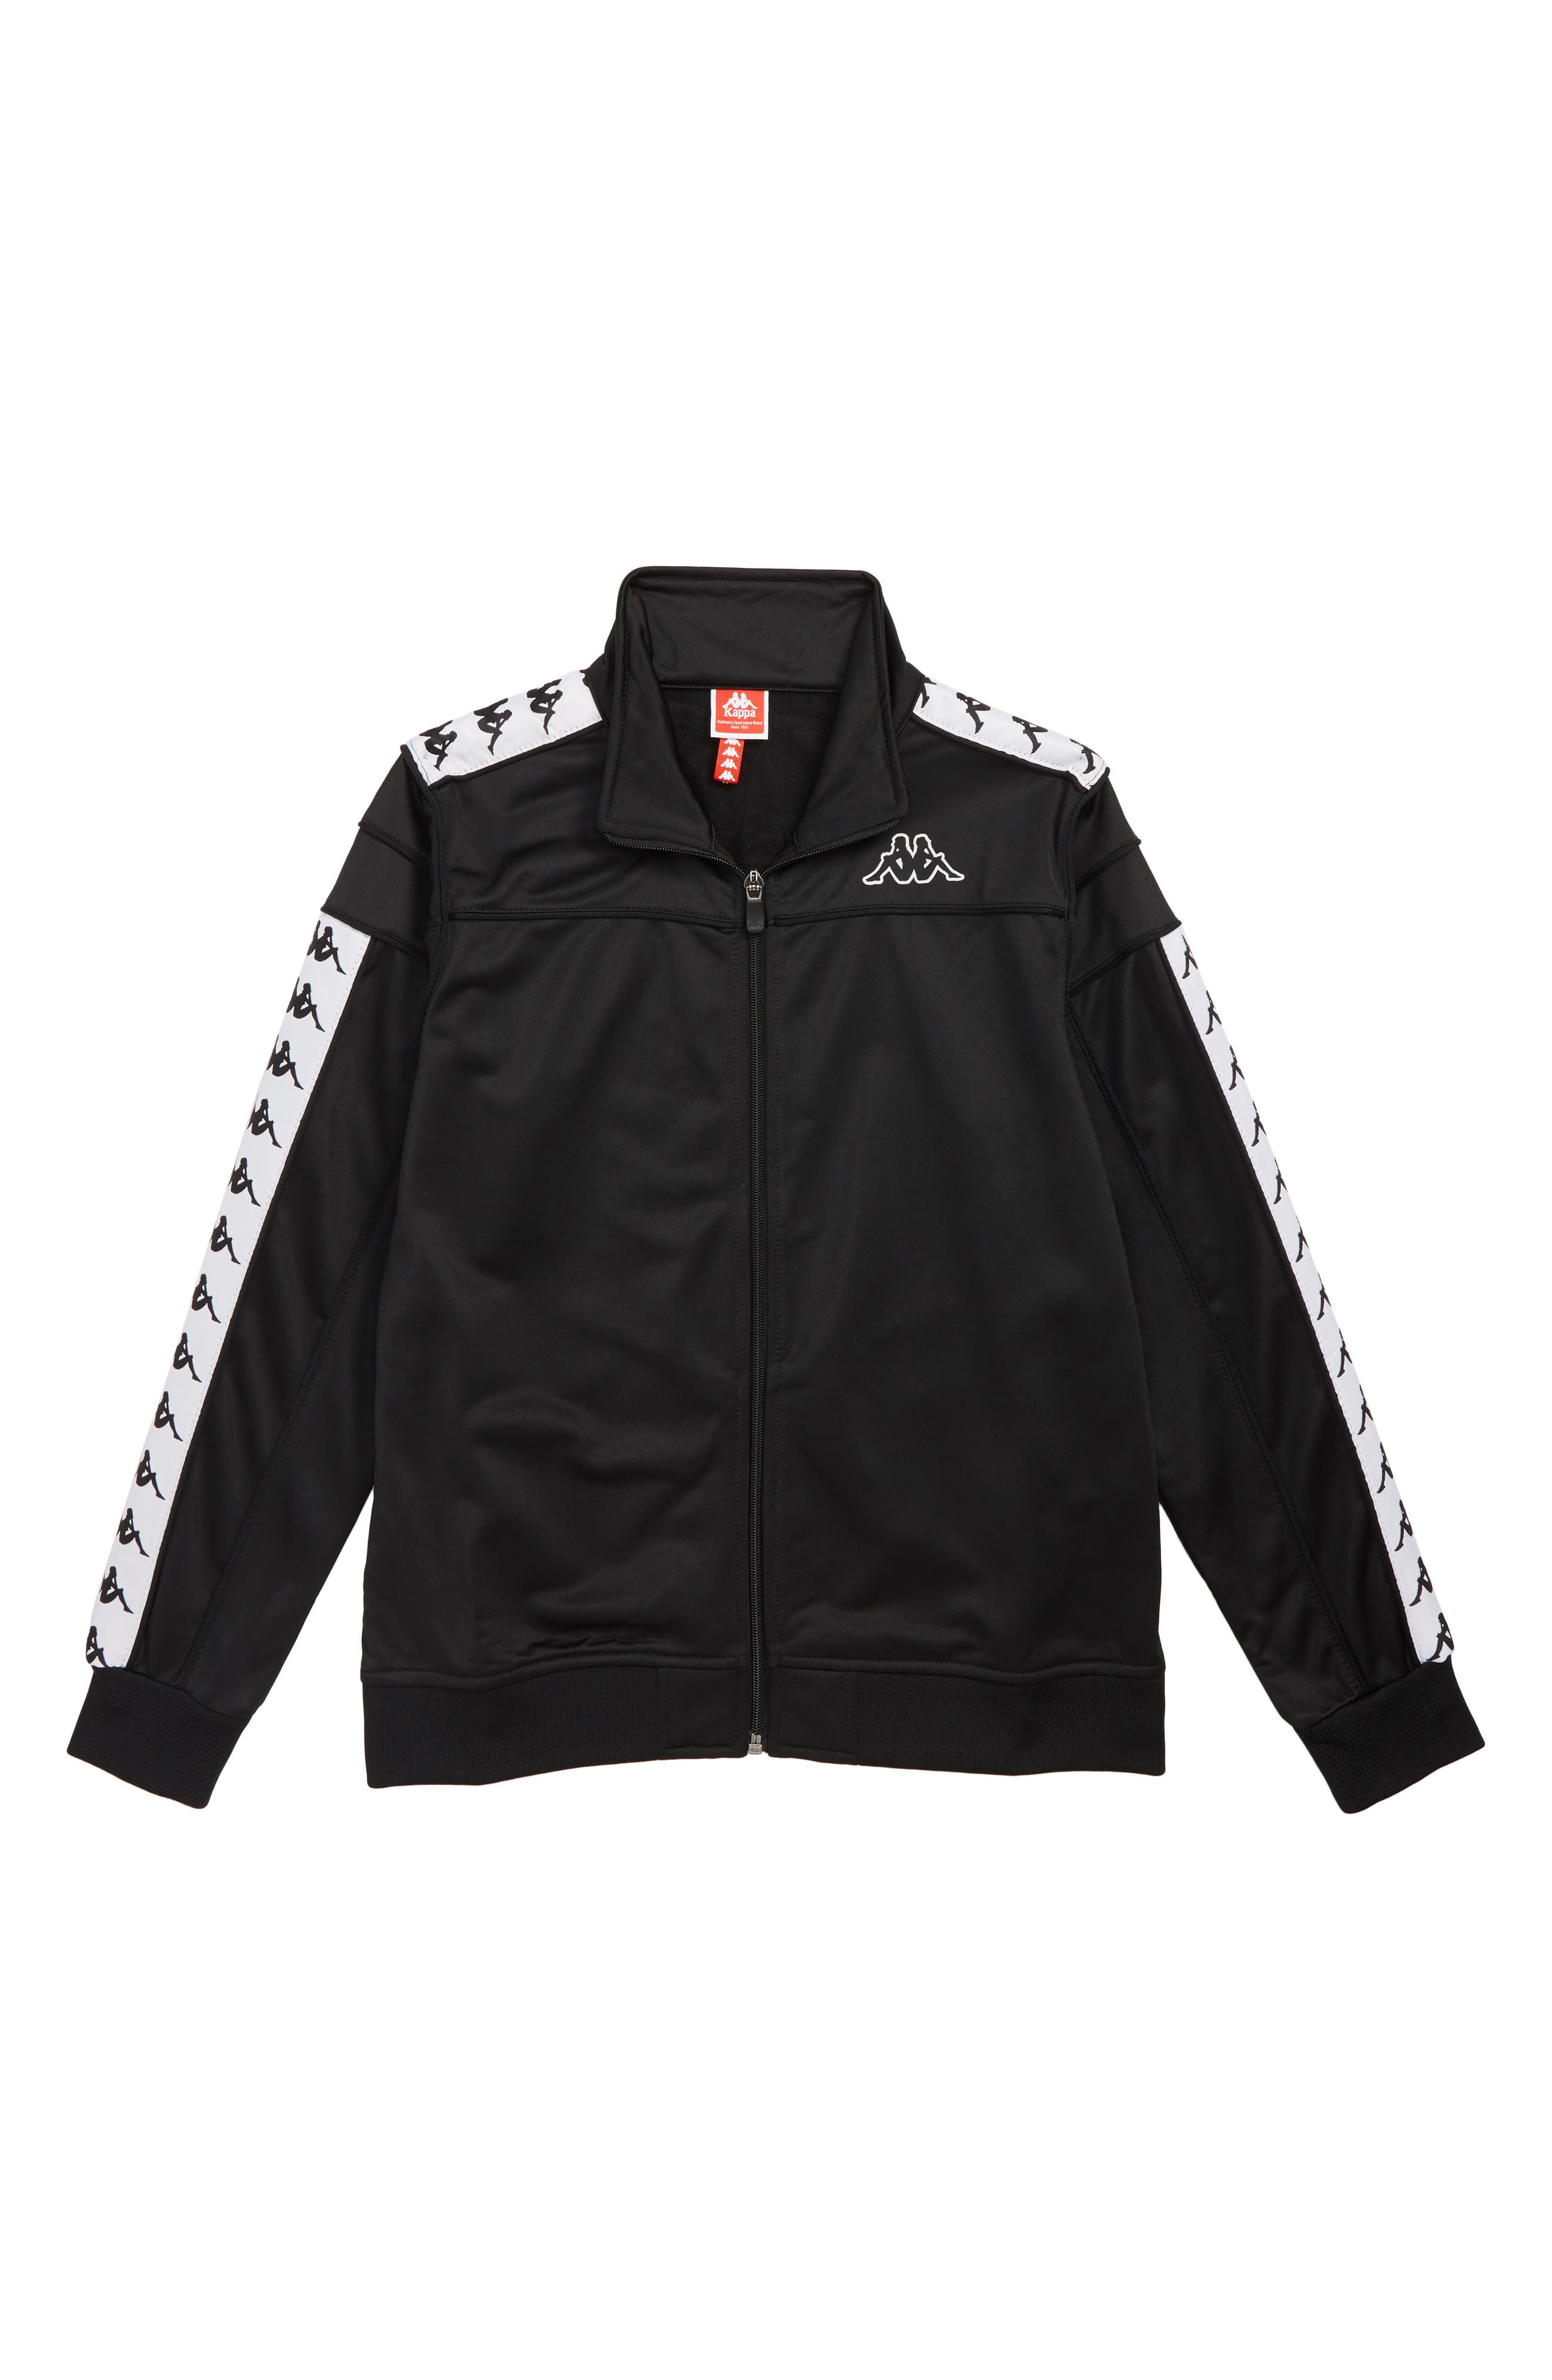 Boys Kappa Banda Merez Slim Track Jacket Size L (10y)  Black